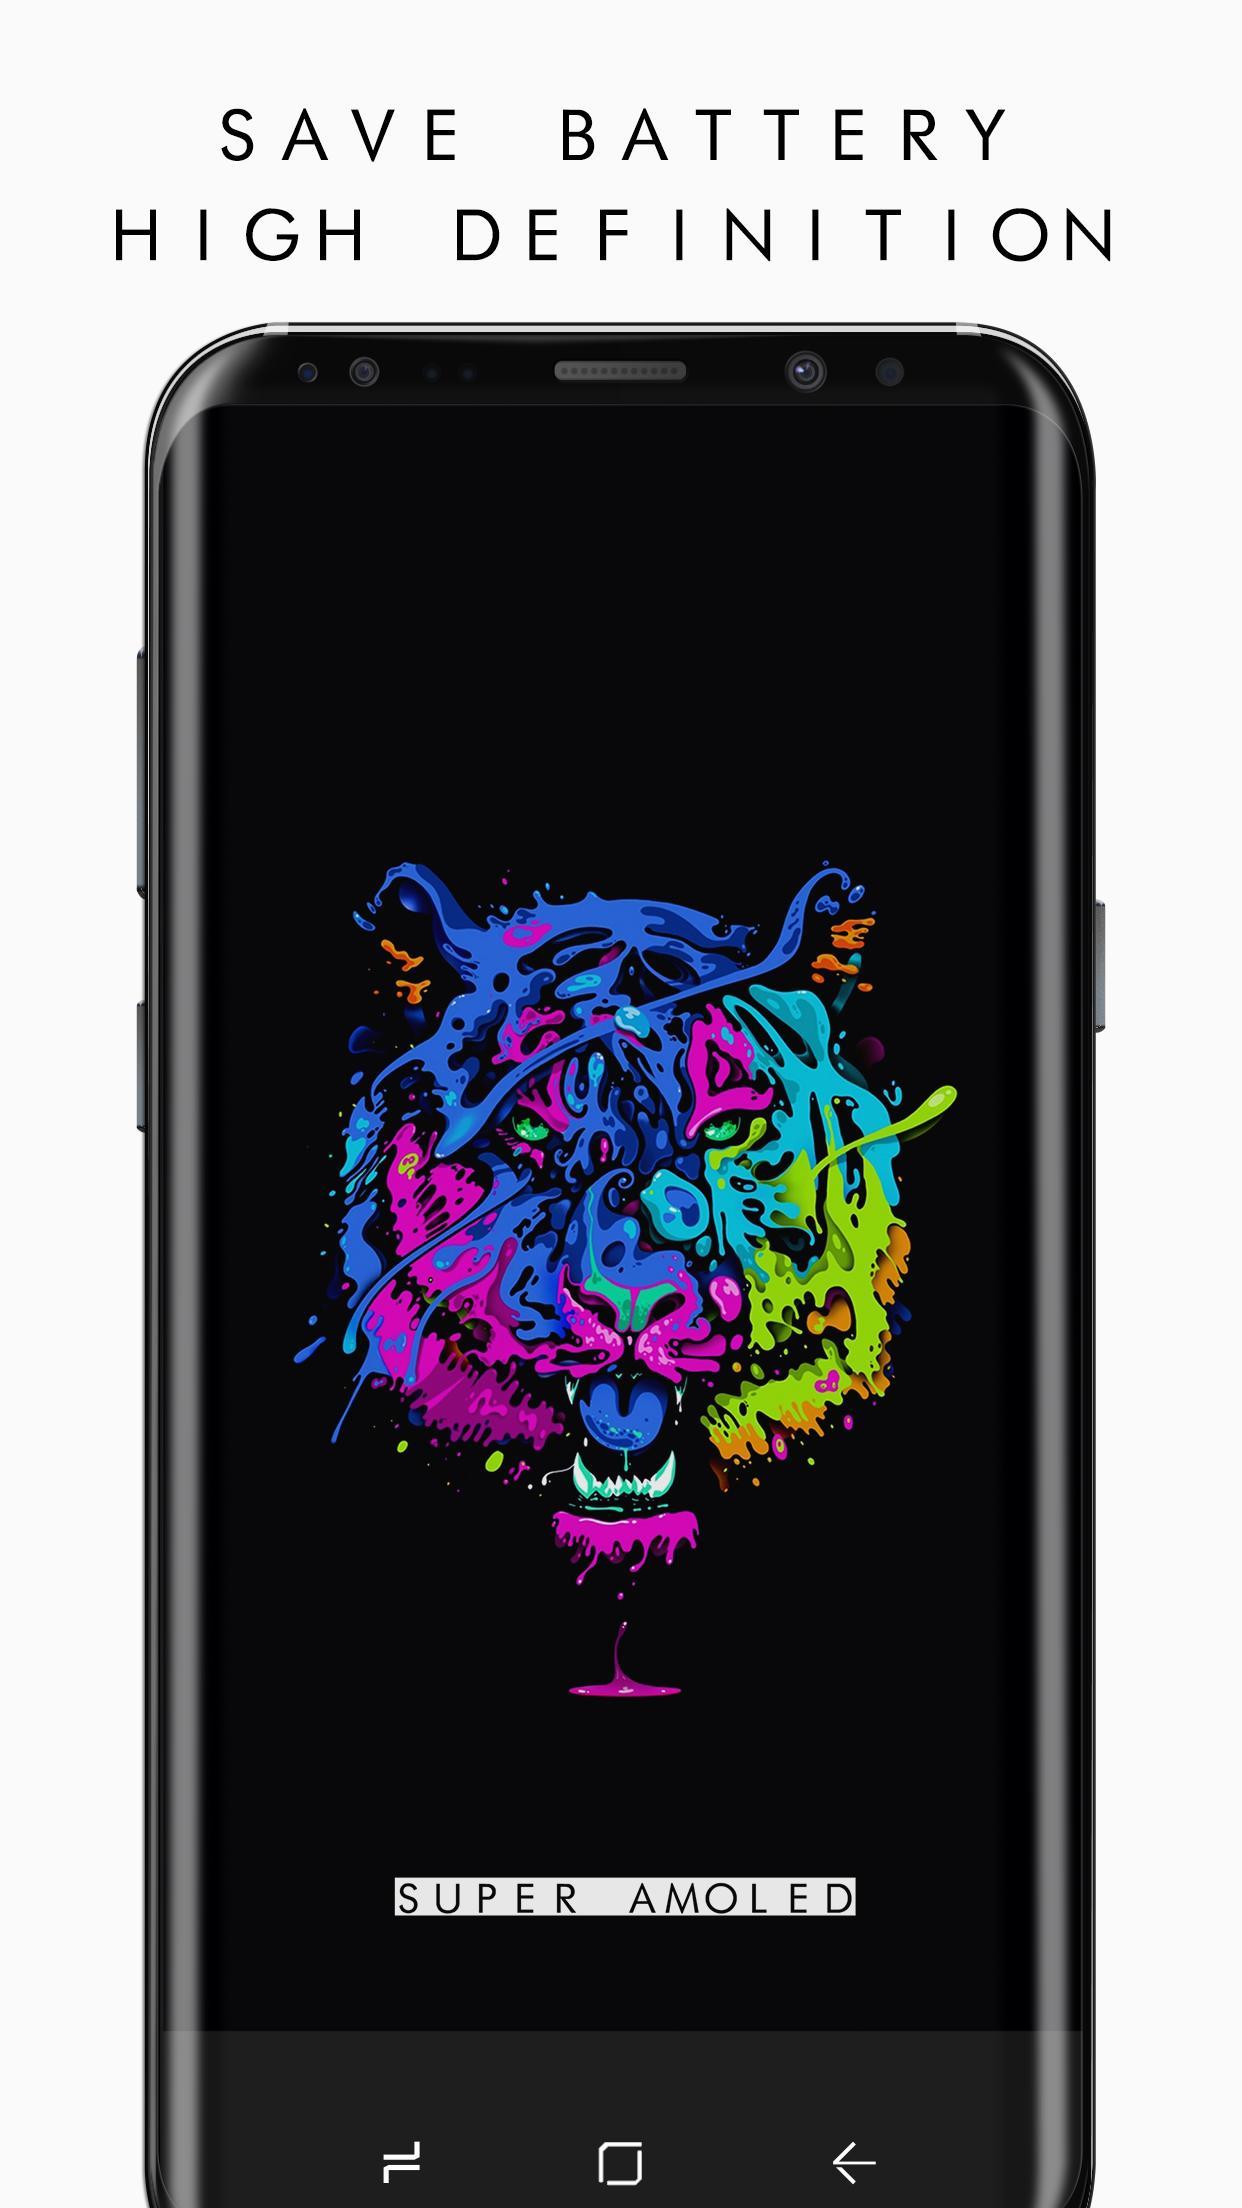 Pixel 3 Super AMOLED Wallpapers PRO (2960×1440) v2 [Paid] APK [Latest] 1